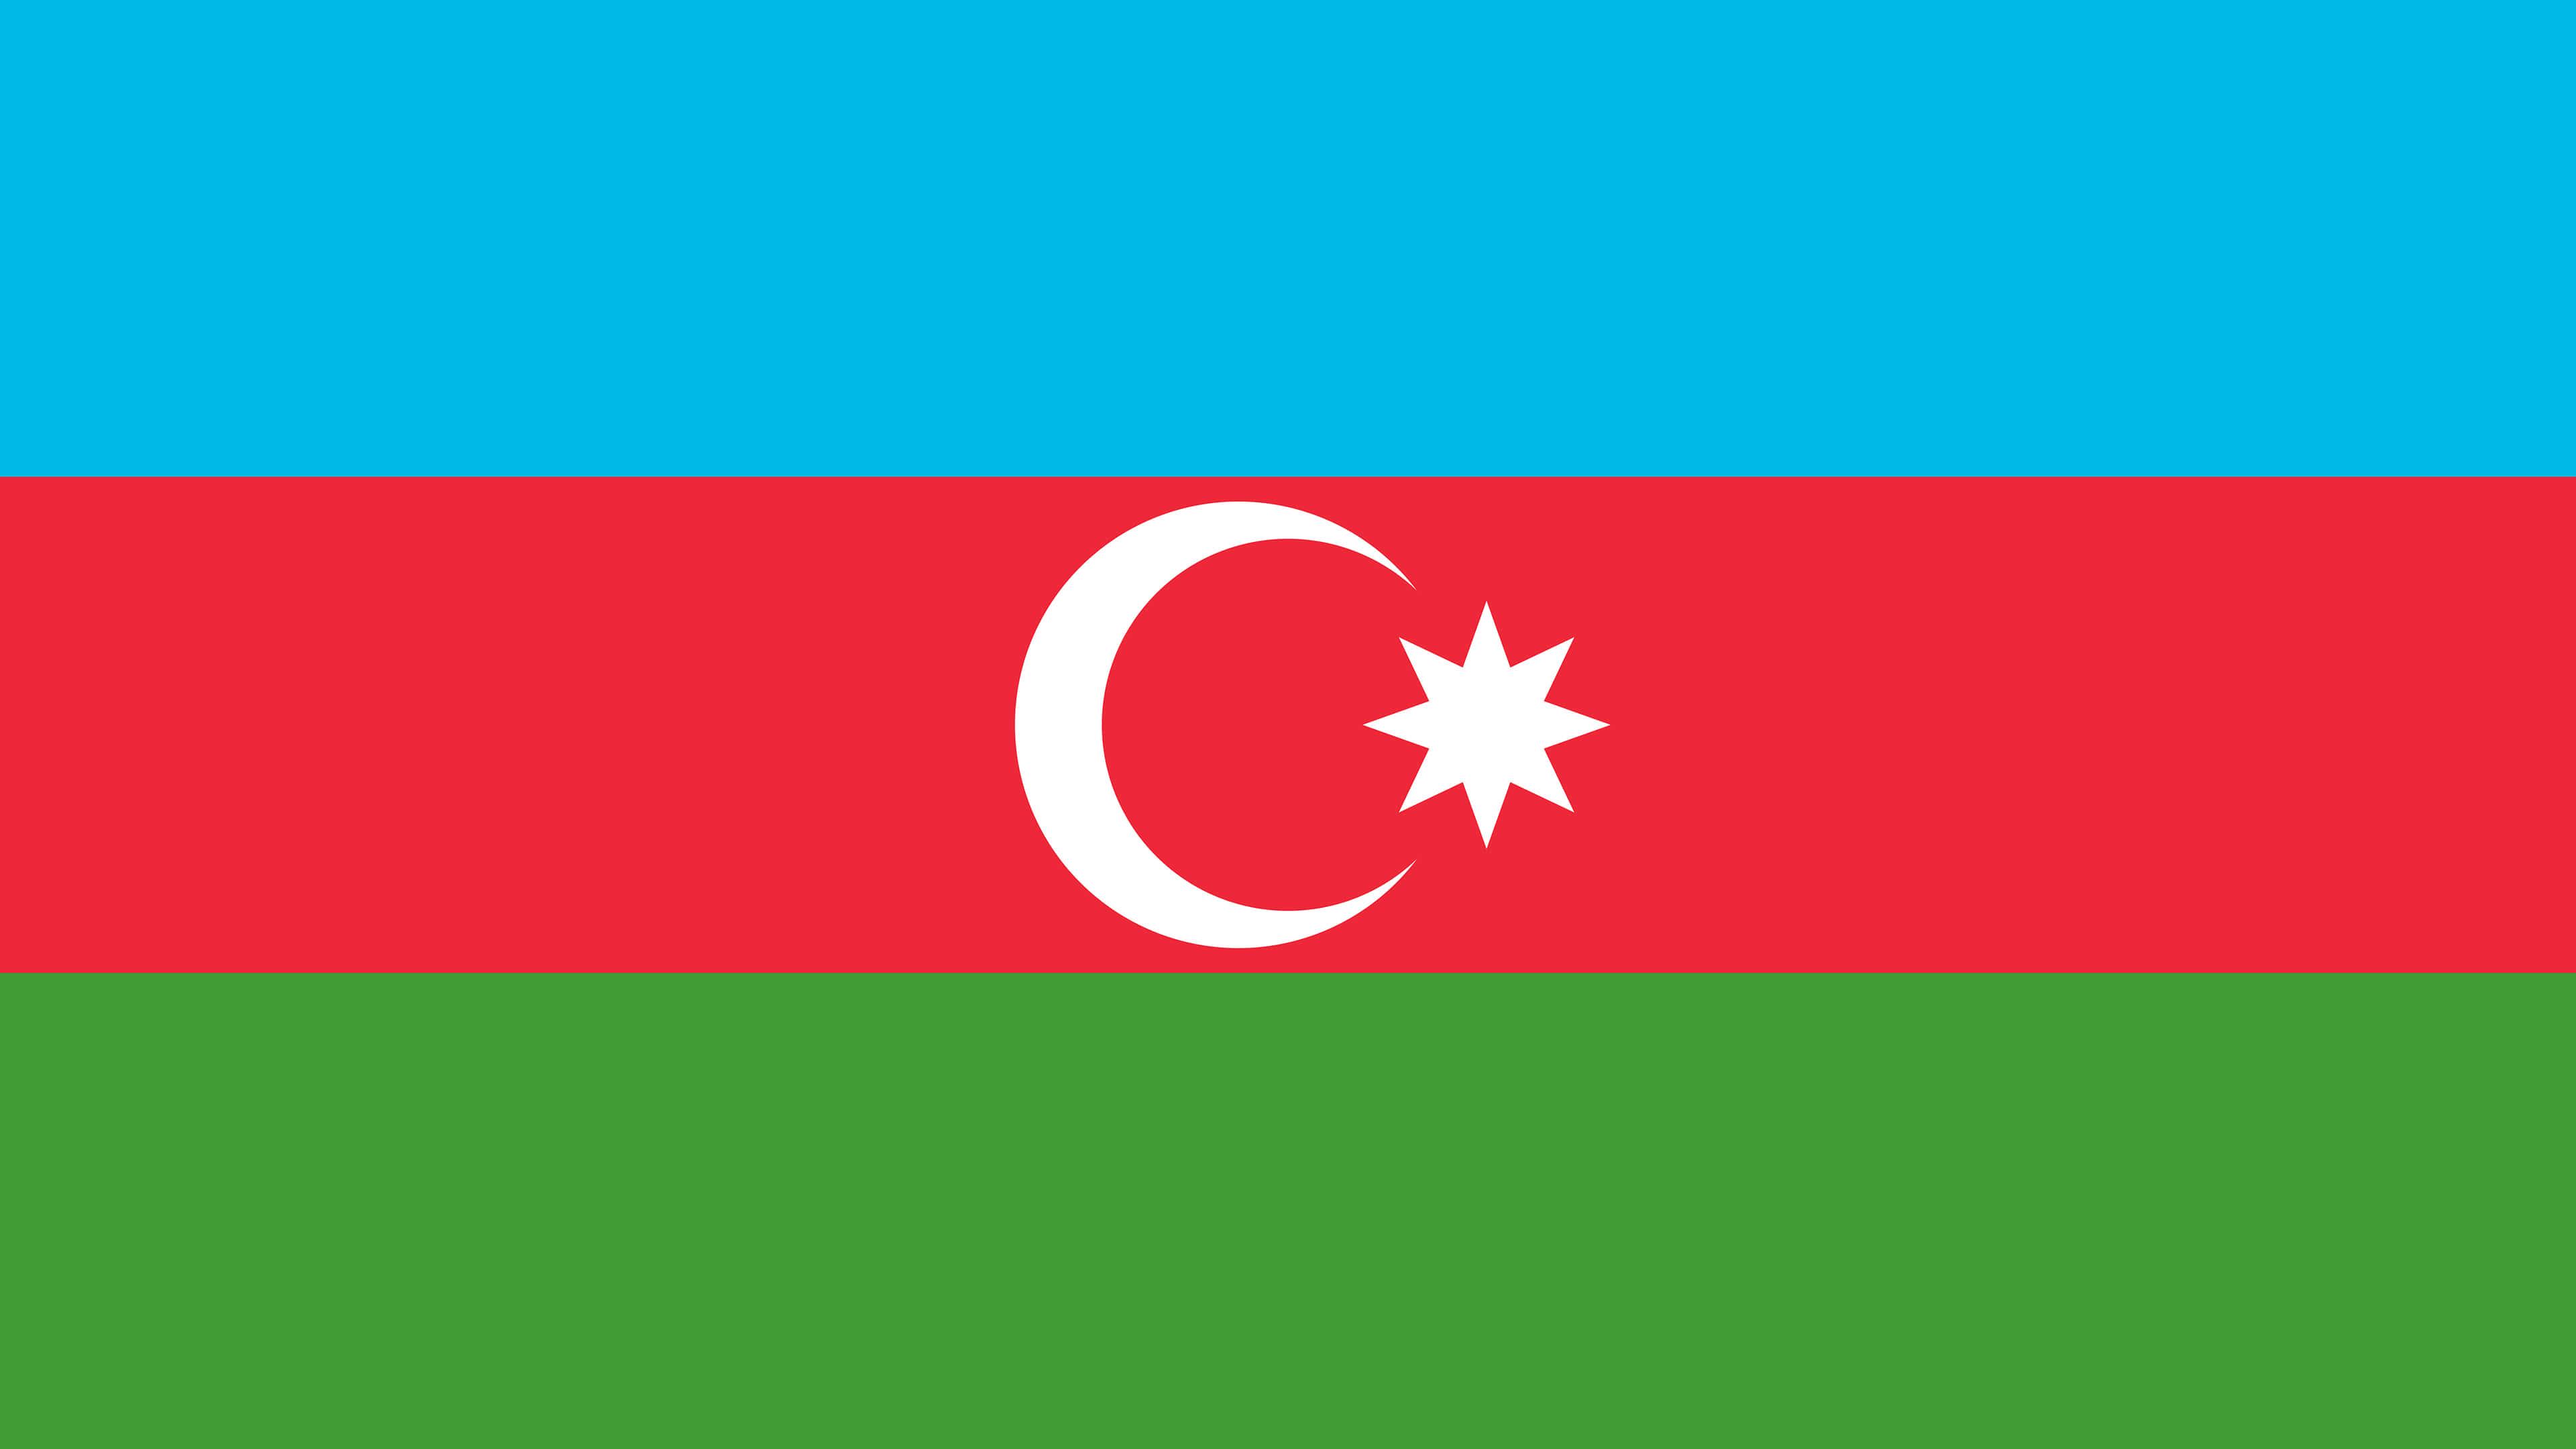 azerbaijan flag uhd 4k wallpaper